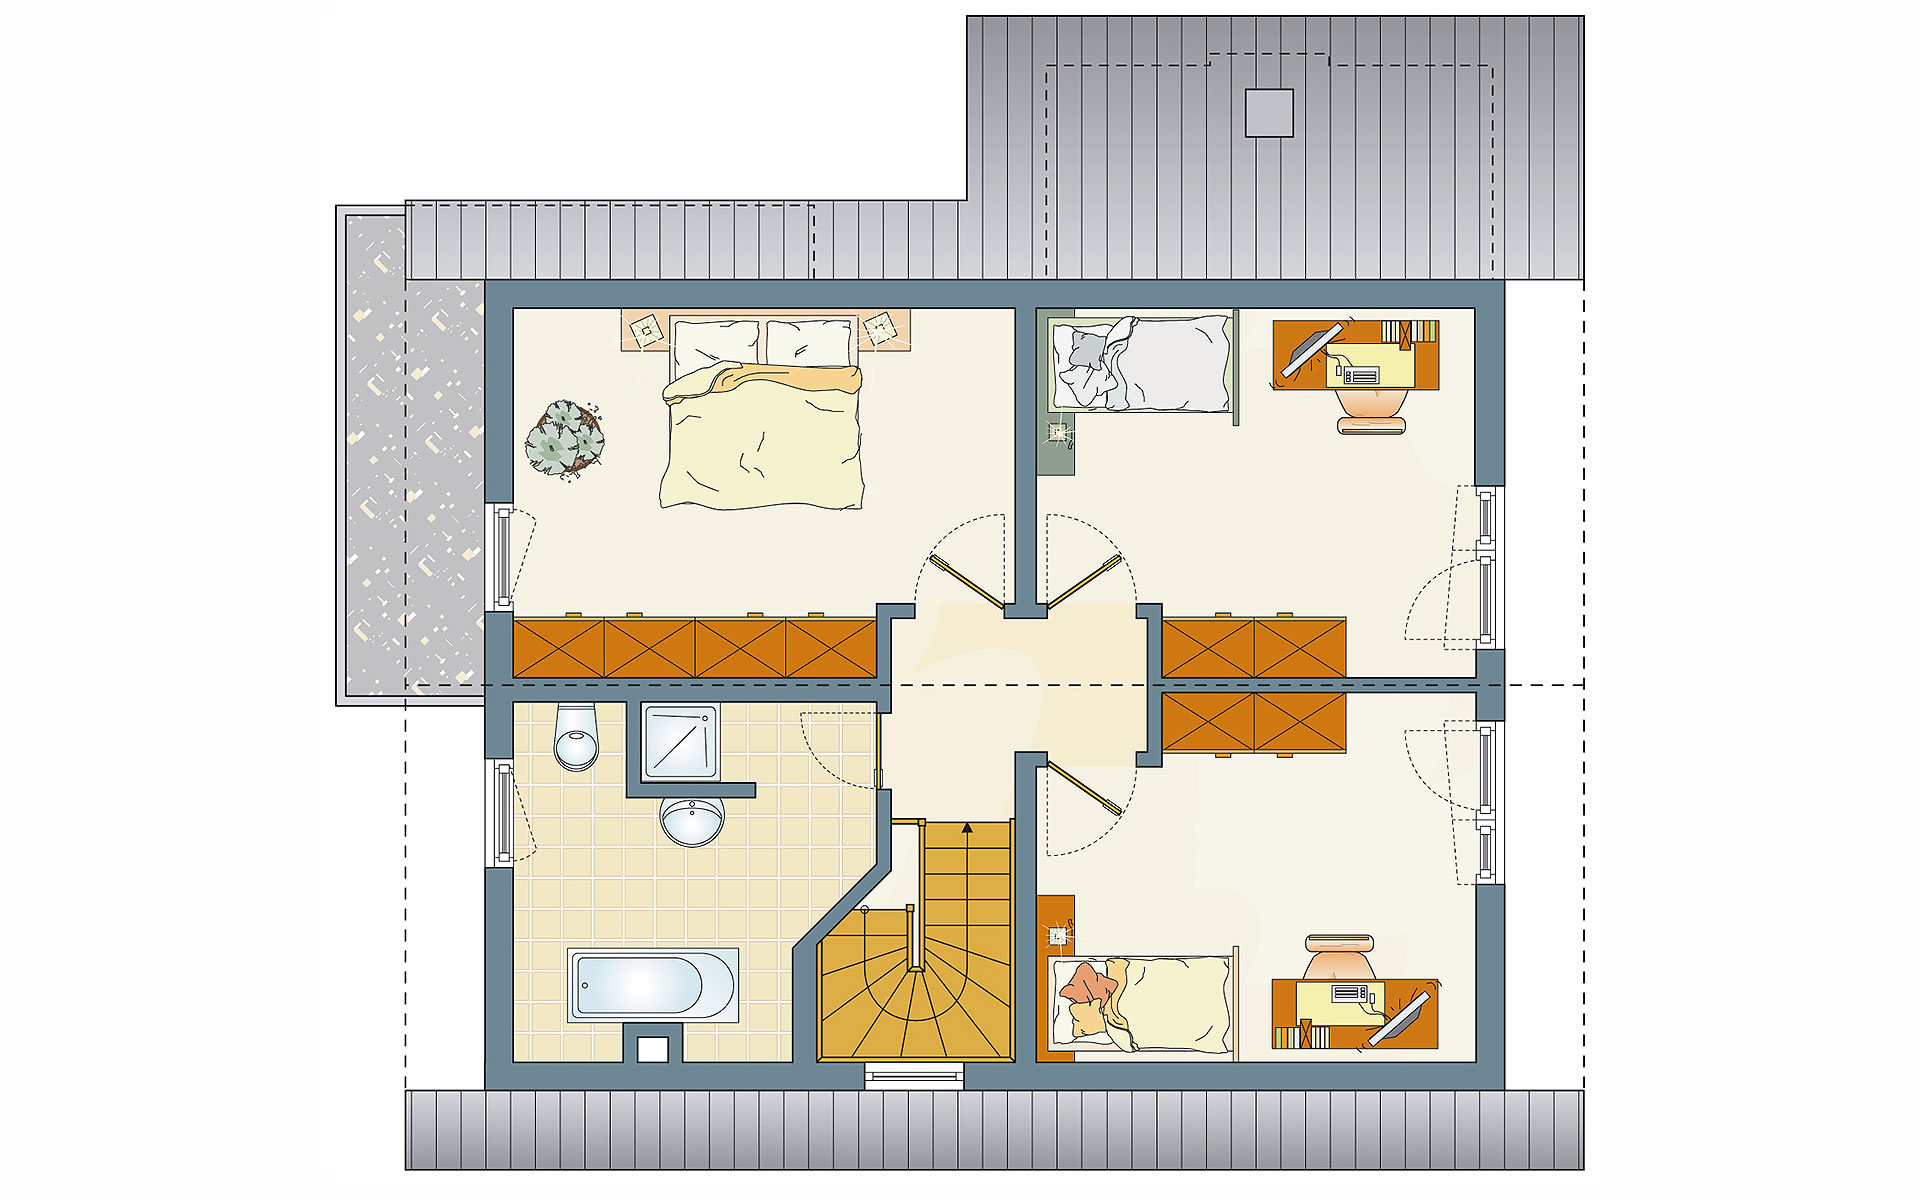 Dachgeschoss Frei geplant - FLAIRplus - Musterhaus Marburg von FingerHaus GmbH